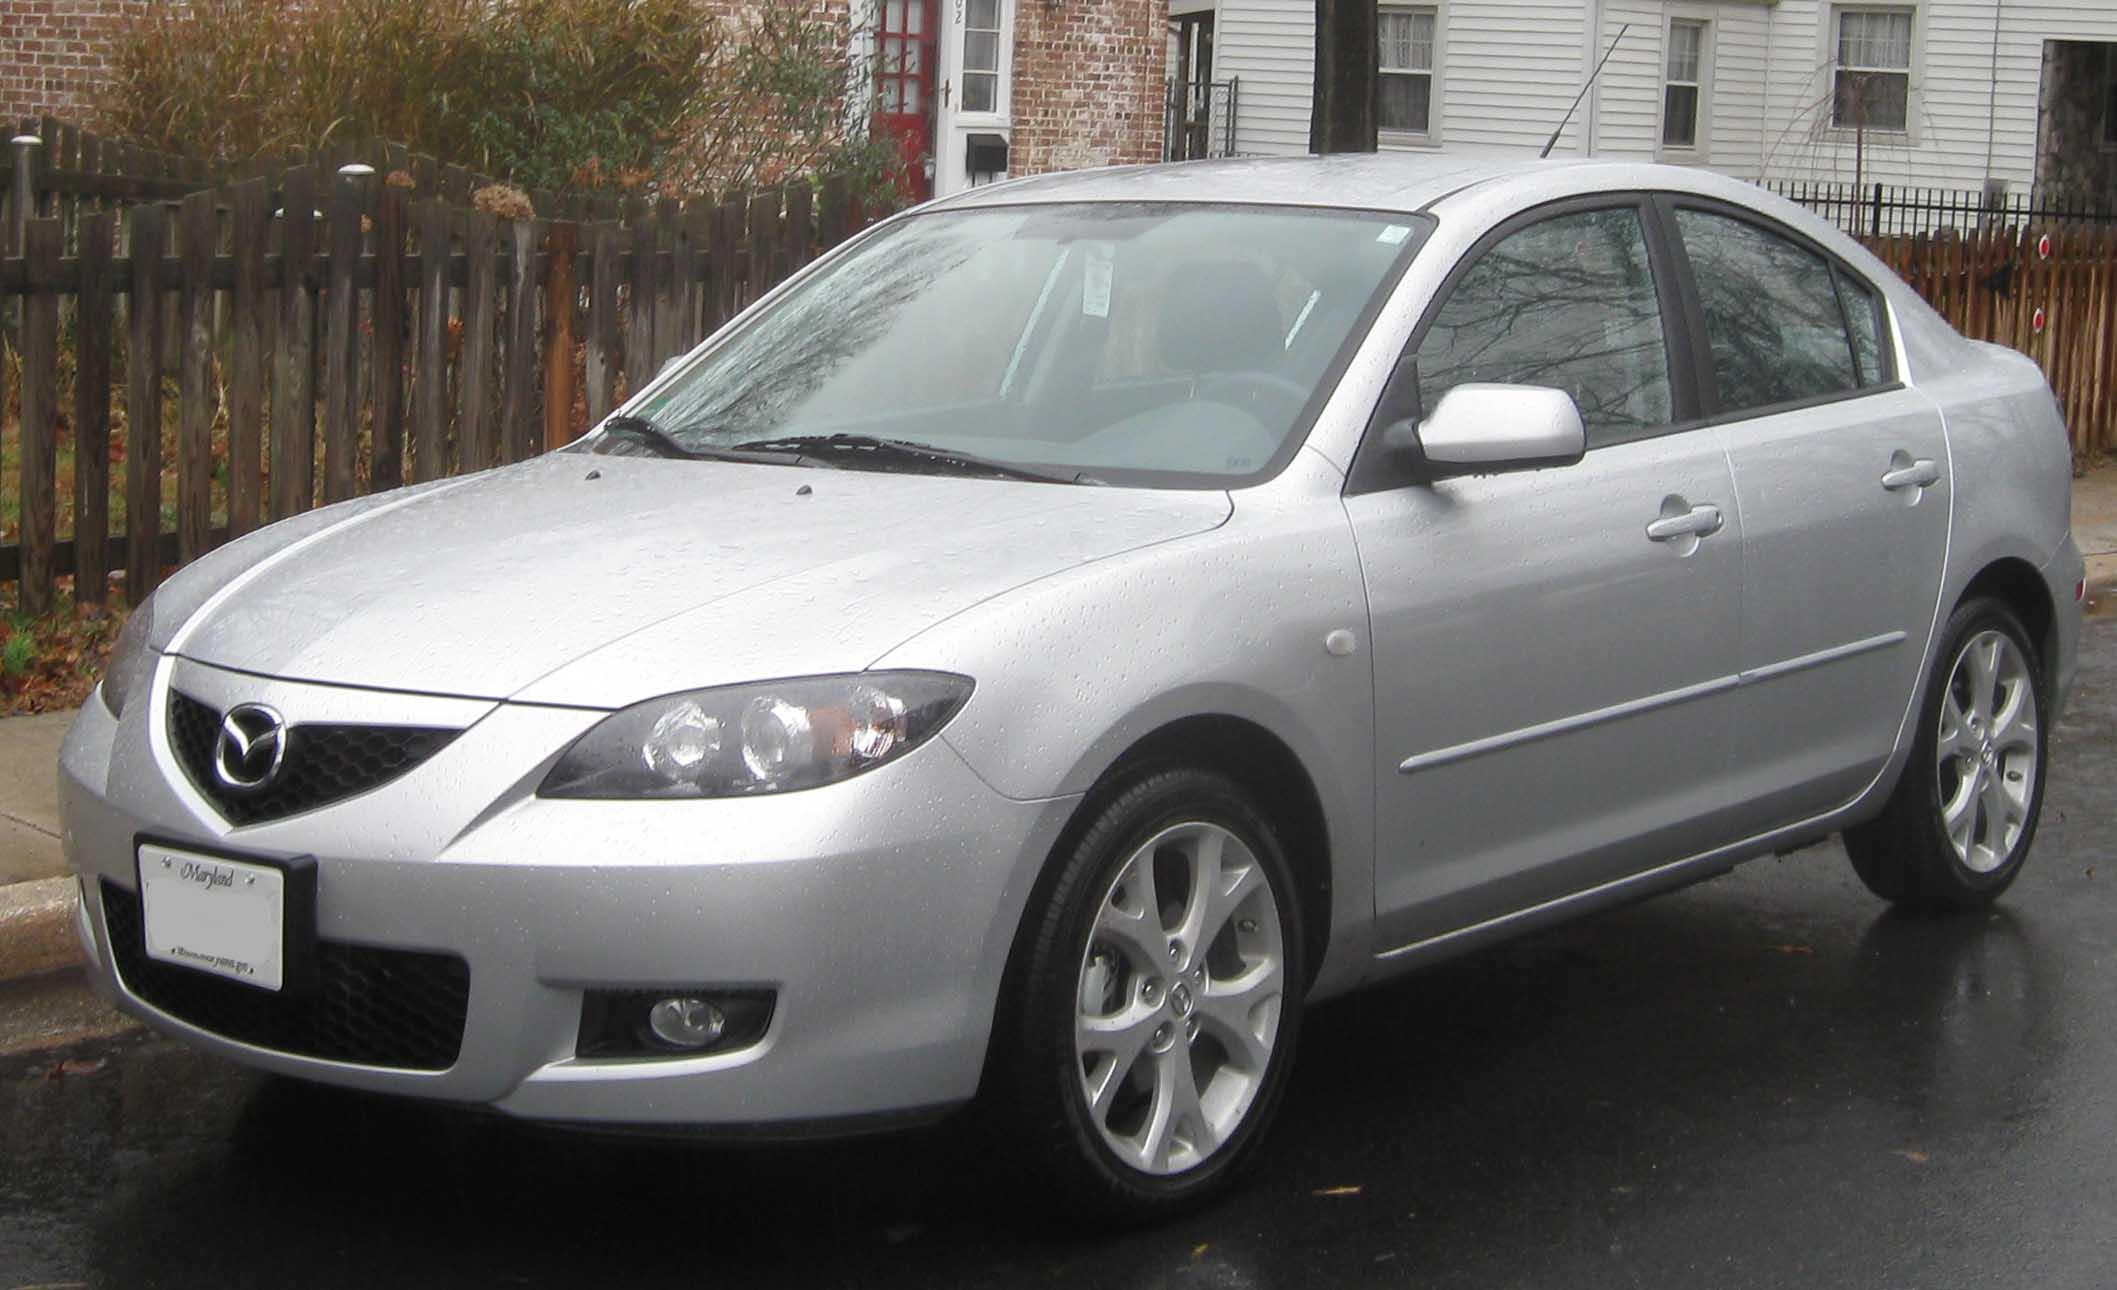 file:2007-2009 mazda 3 sedan - wikimedia commons